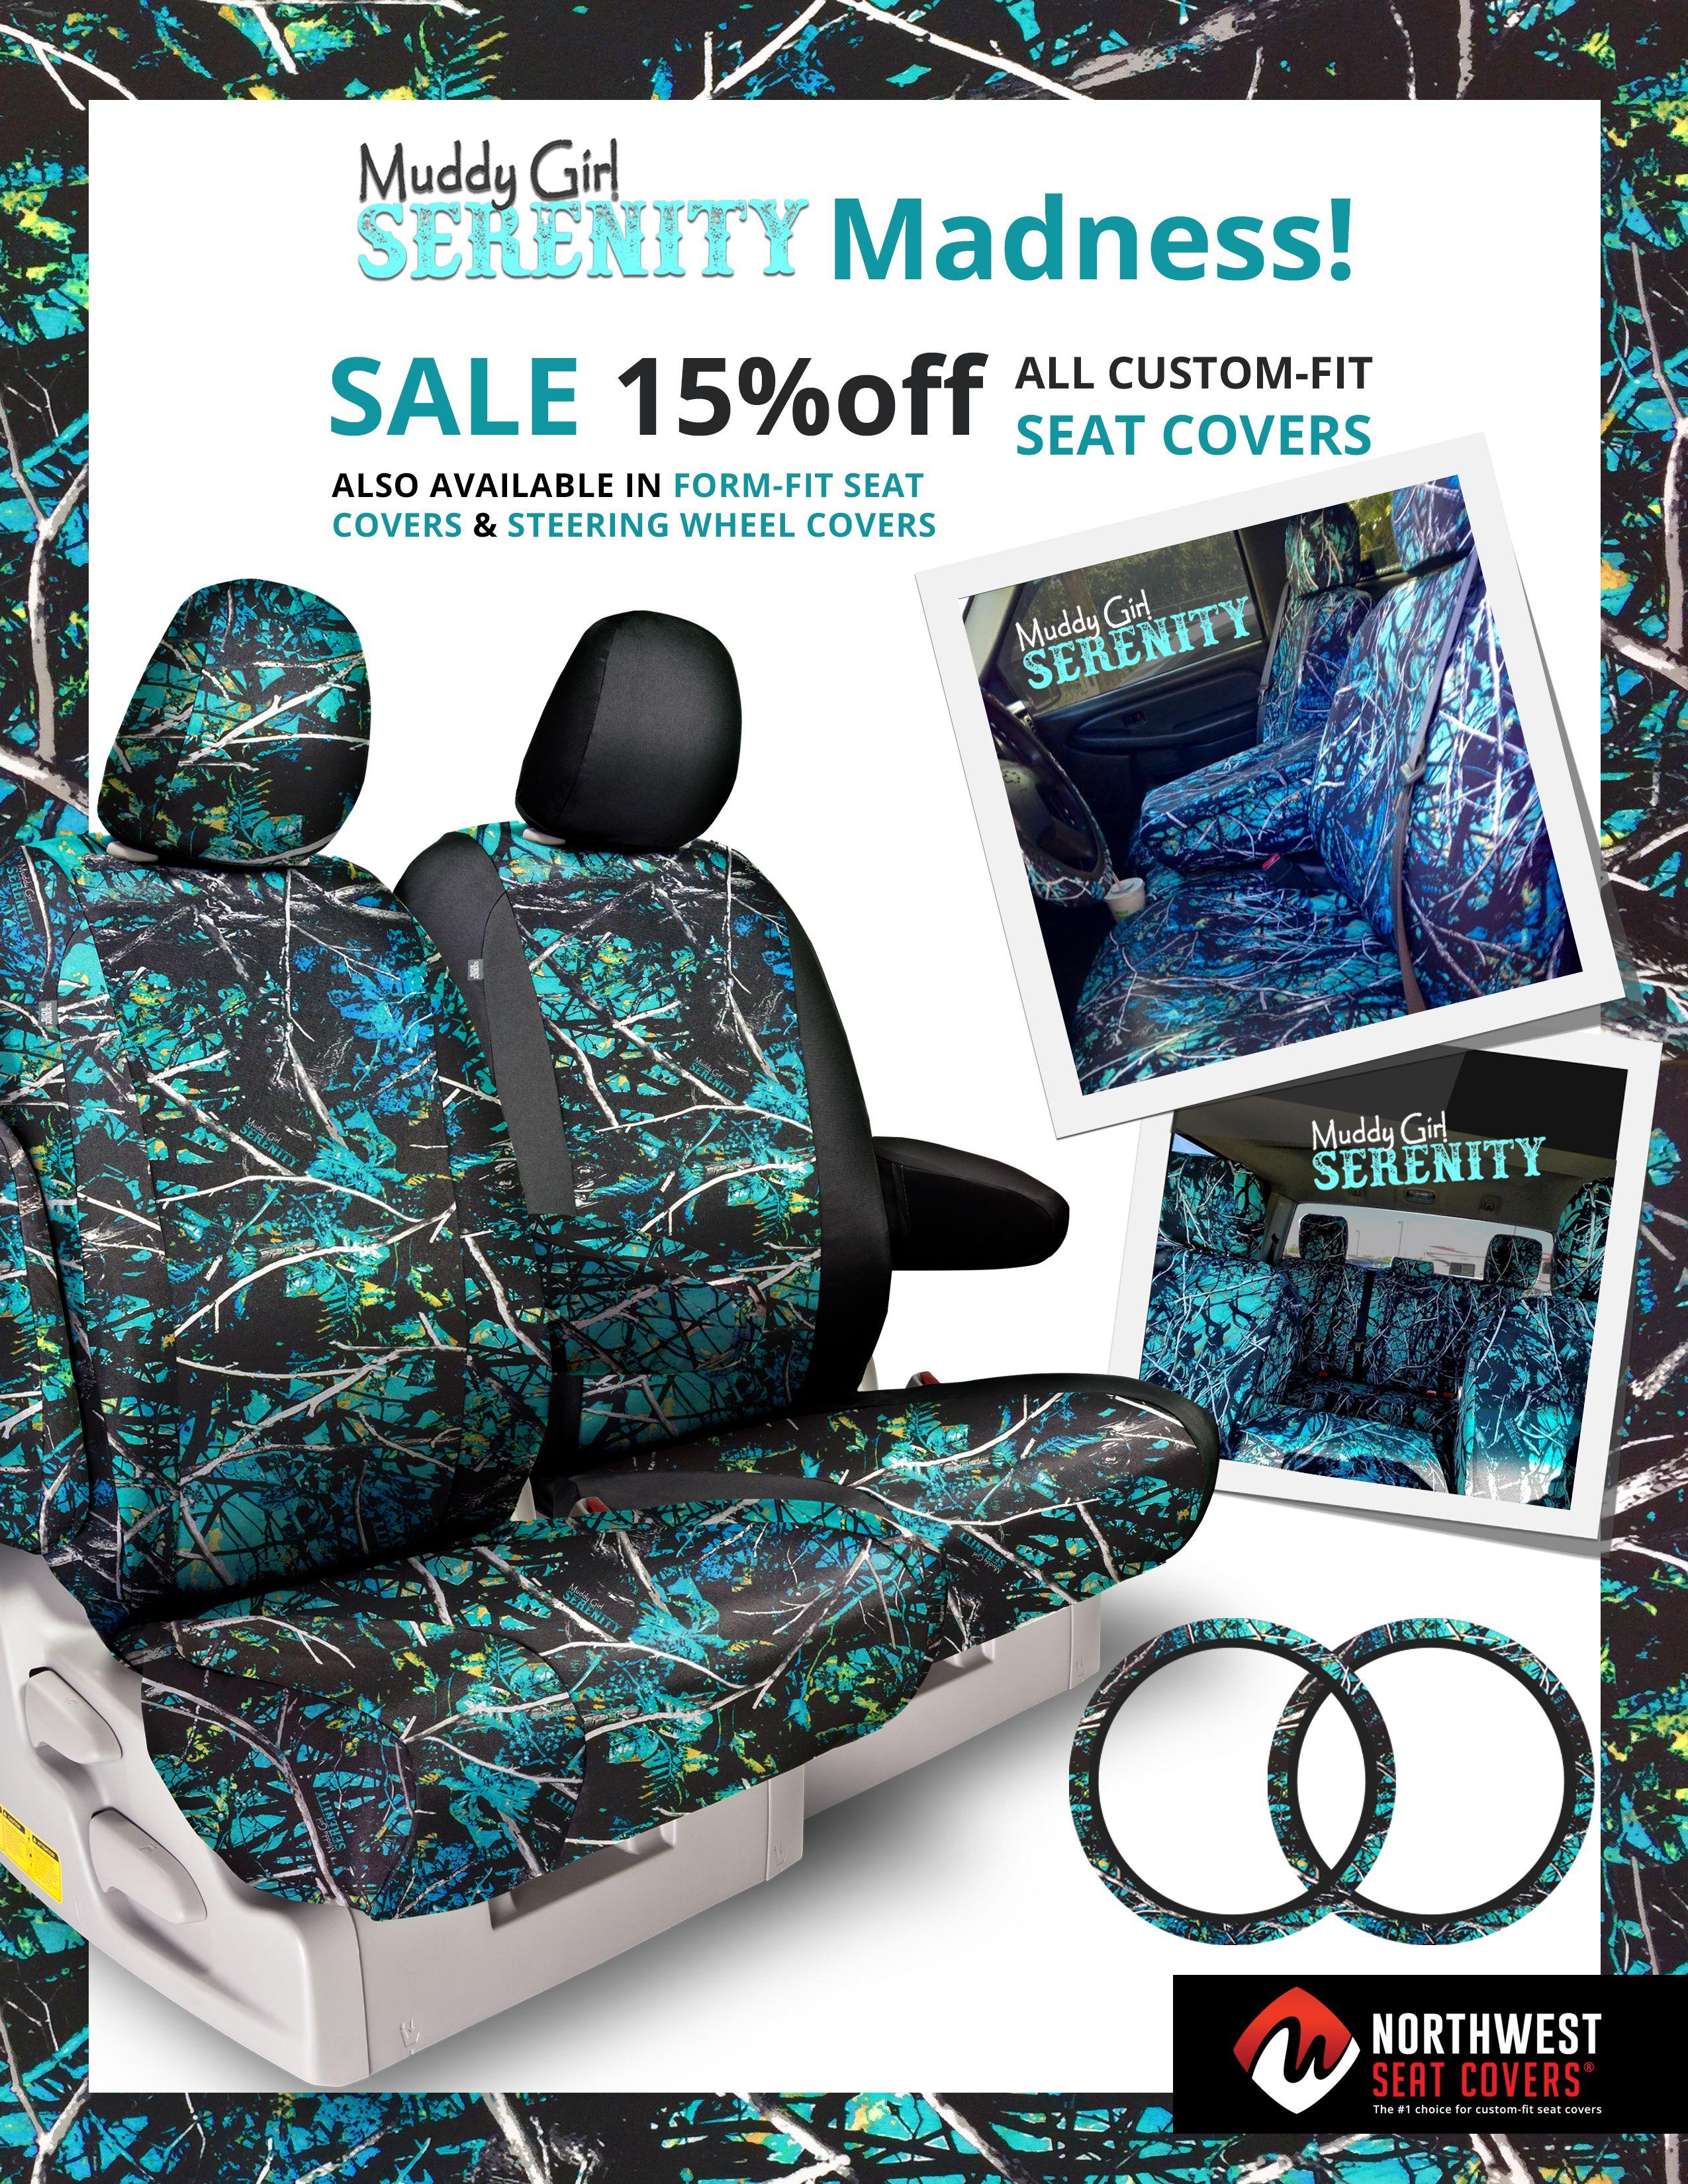 Moonshine Camo Seat Covers Custom Seat Covers Camo Seat Covers Muddy Girl Muddy Girl Seat Covers